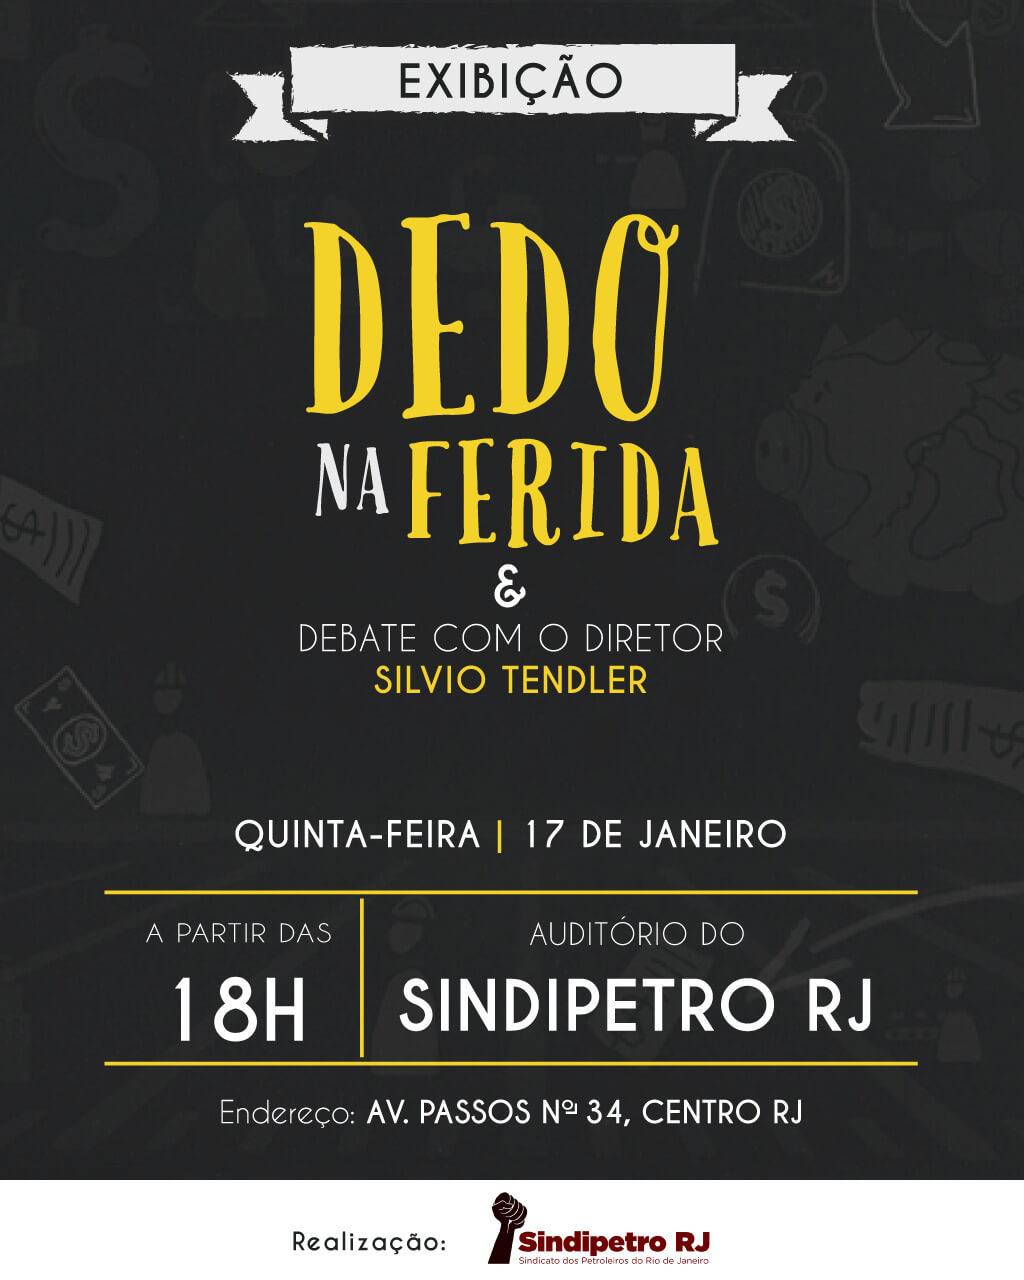 Sindipetro-RJ exibe novo documentário de Silvio Tendler – Dedo na Ferida WhatsApp Image 2018 12 28 at 08  A10 WhatsApp Image 2018 12 28 at 08